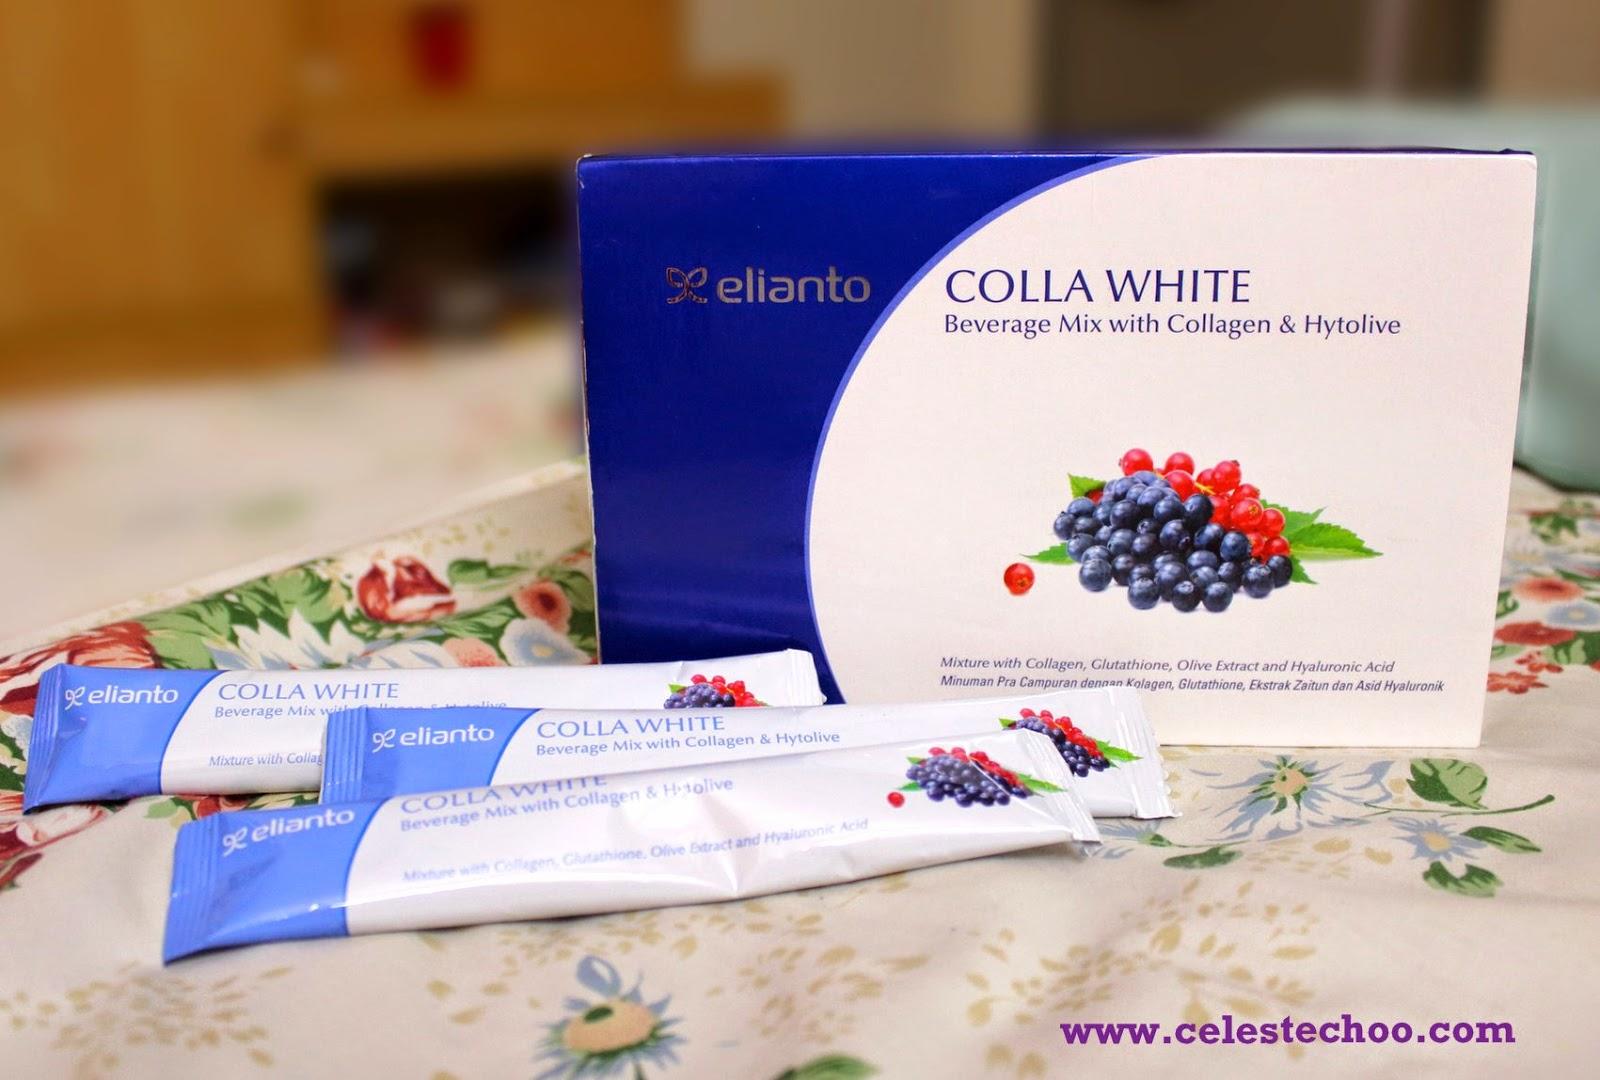 elianto-colla-white-beauty-drink-for-firmer-fairer-skin